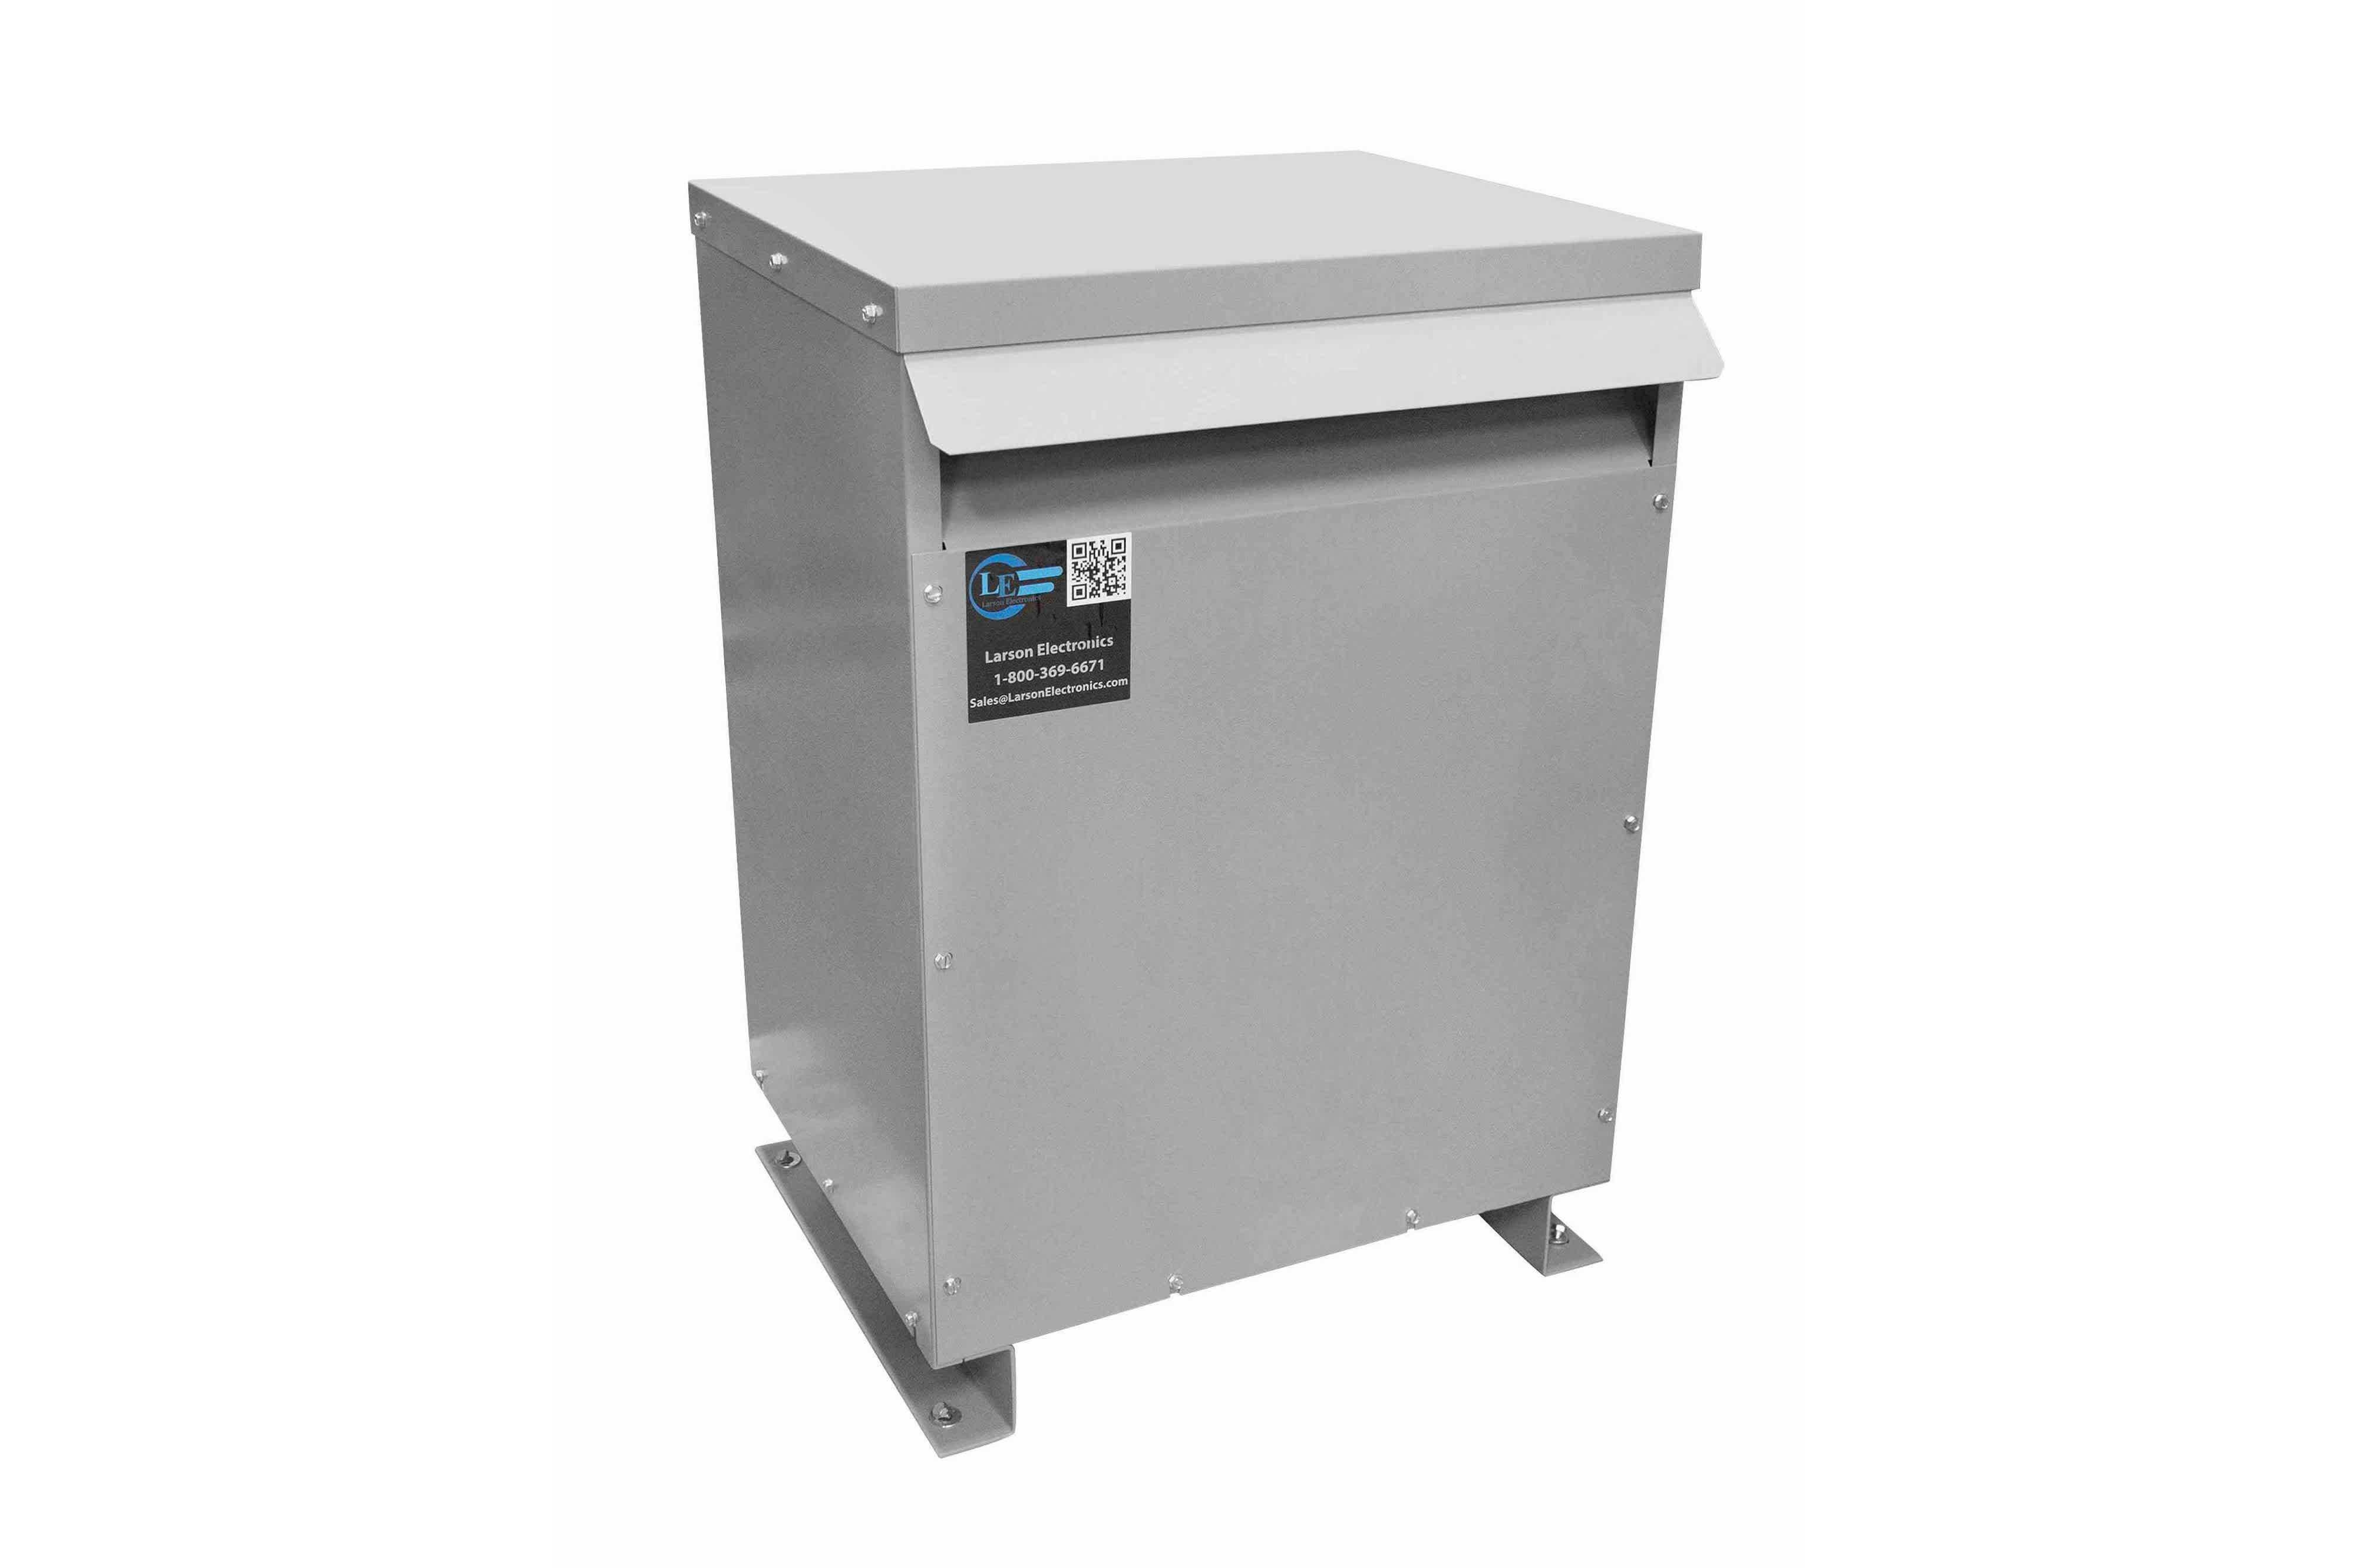 300 kVA 3PH Isolation Transformer, 415V Wye Primary, 480V Delta Secondary, N3R, Ventilated, 60 Hz